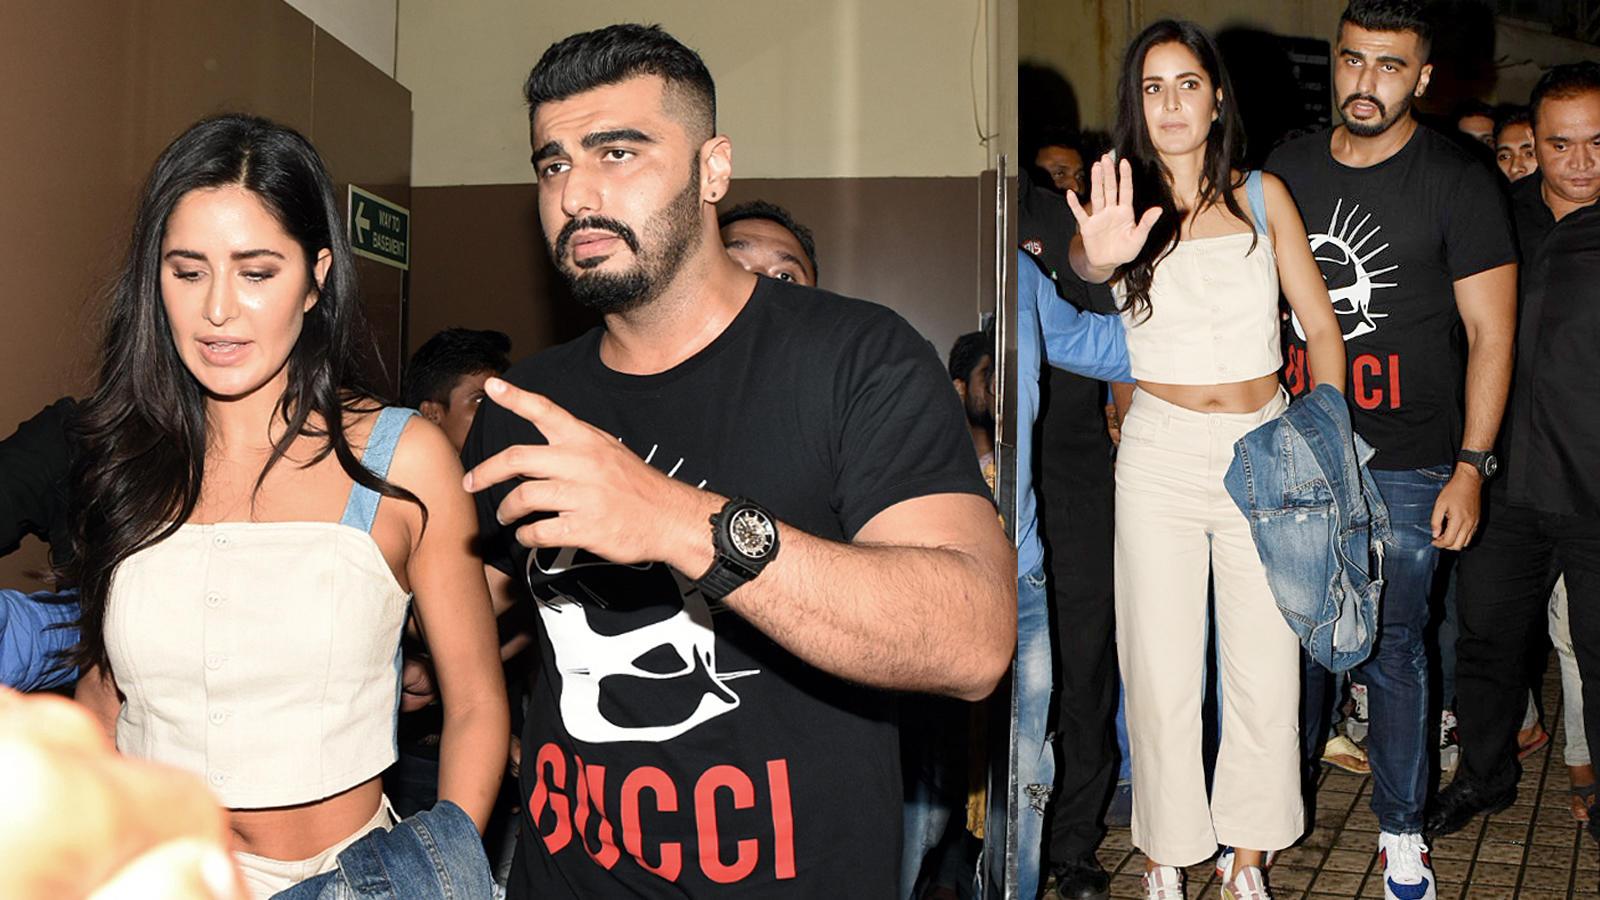 arjun-kapoor-turns-protective-friend-escorts-katrina-kaif-to-her-car-amidst-paparazzi